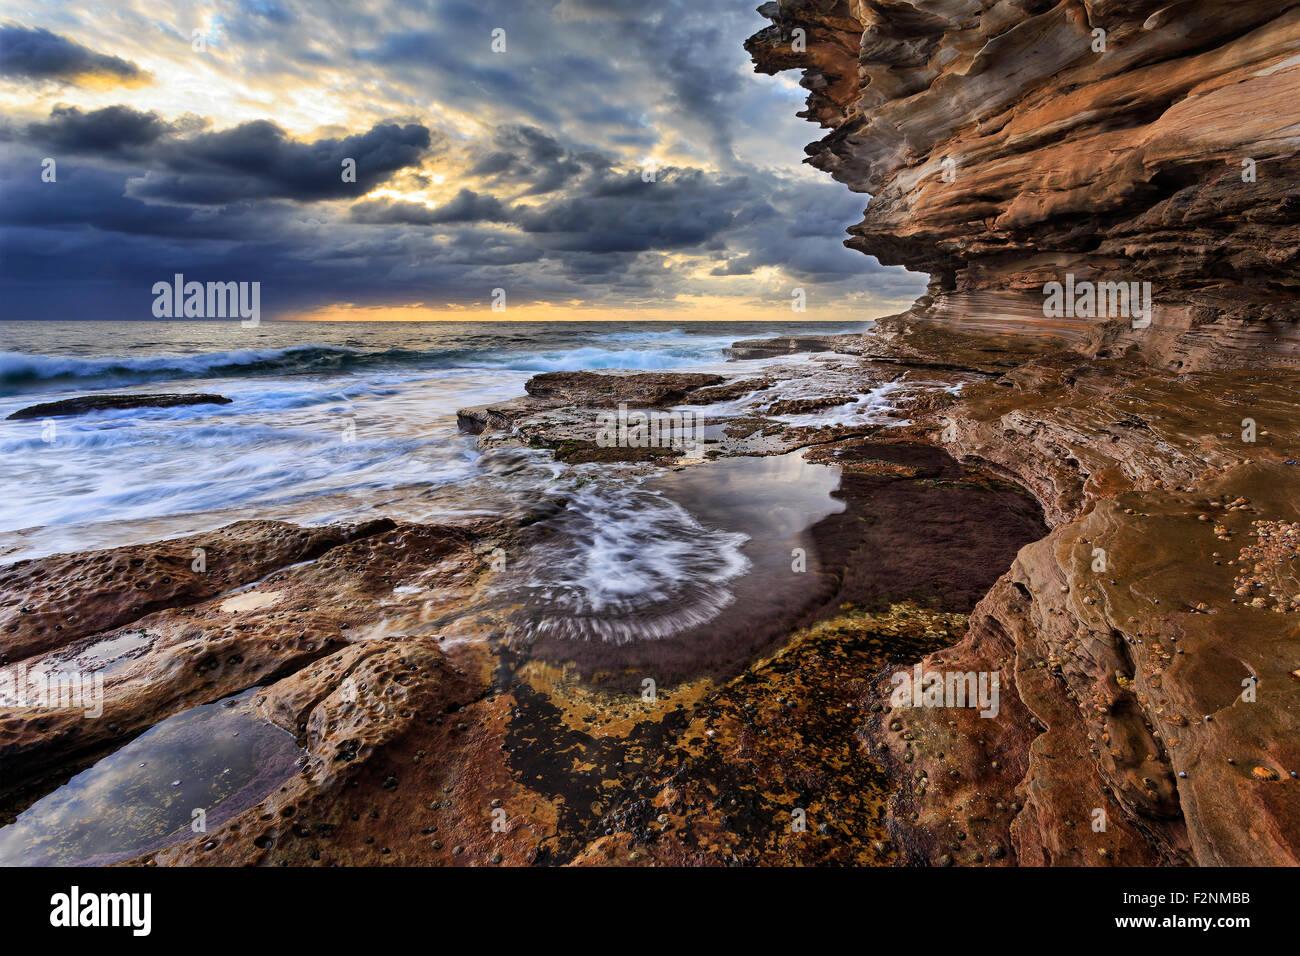 natural sandstone rocks forming high rising landscape at sea edge of coastal line in Sydney, Australia - Stock Image